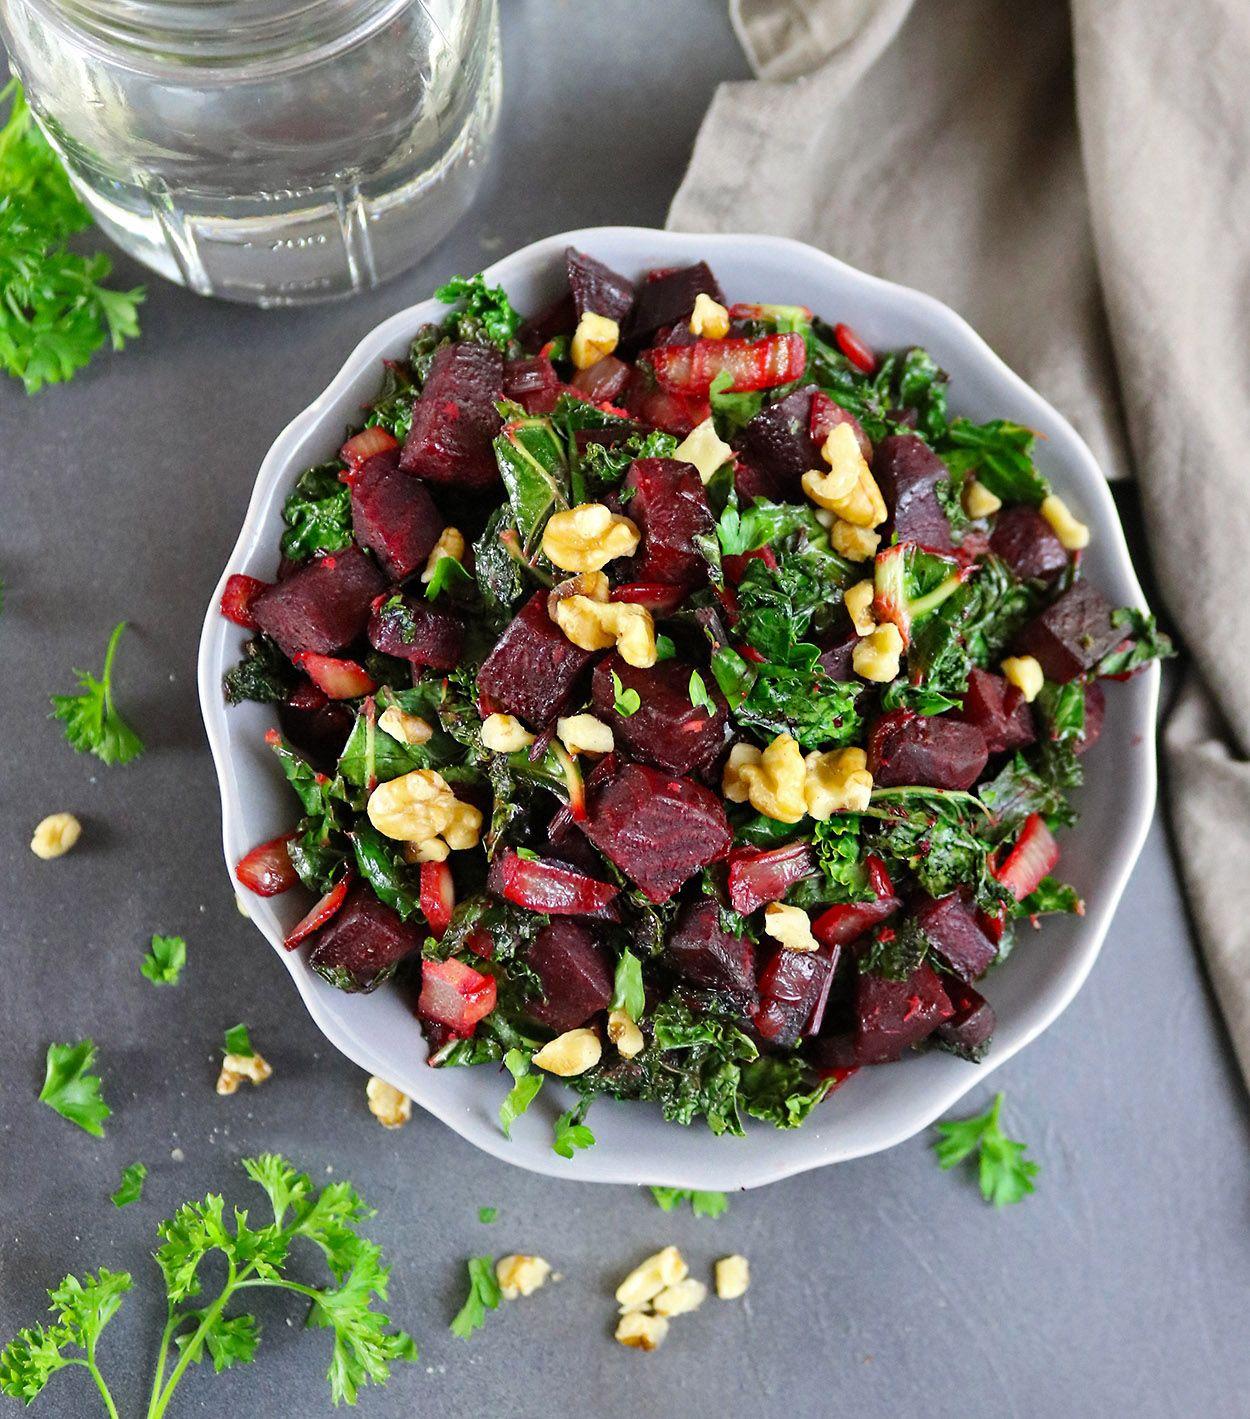 Warm Ginger Beet Kale Salad With Walnuts Recipe Summer Salad